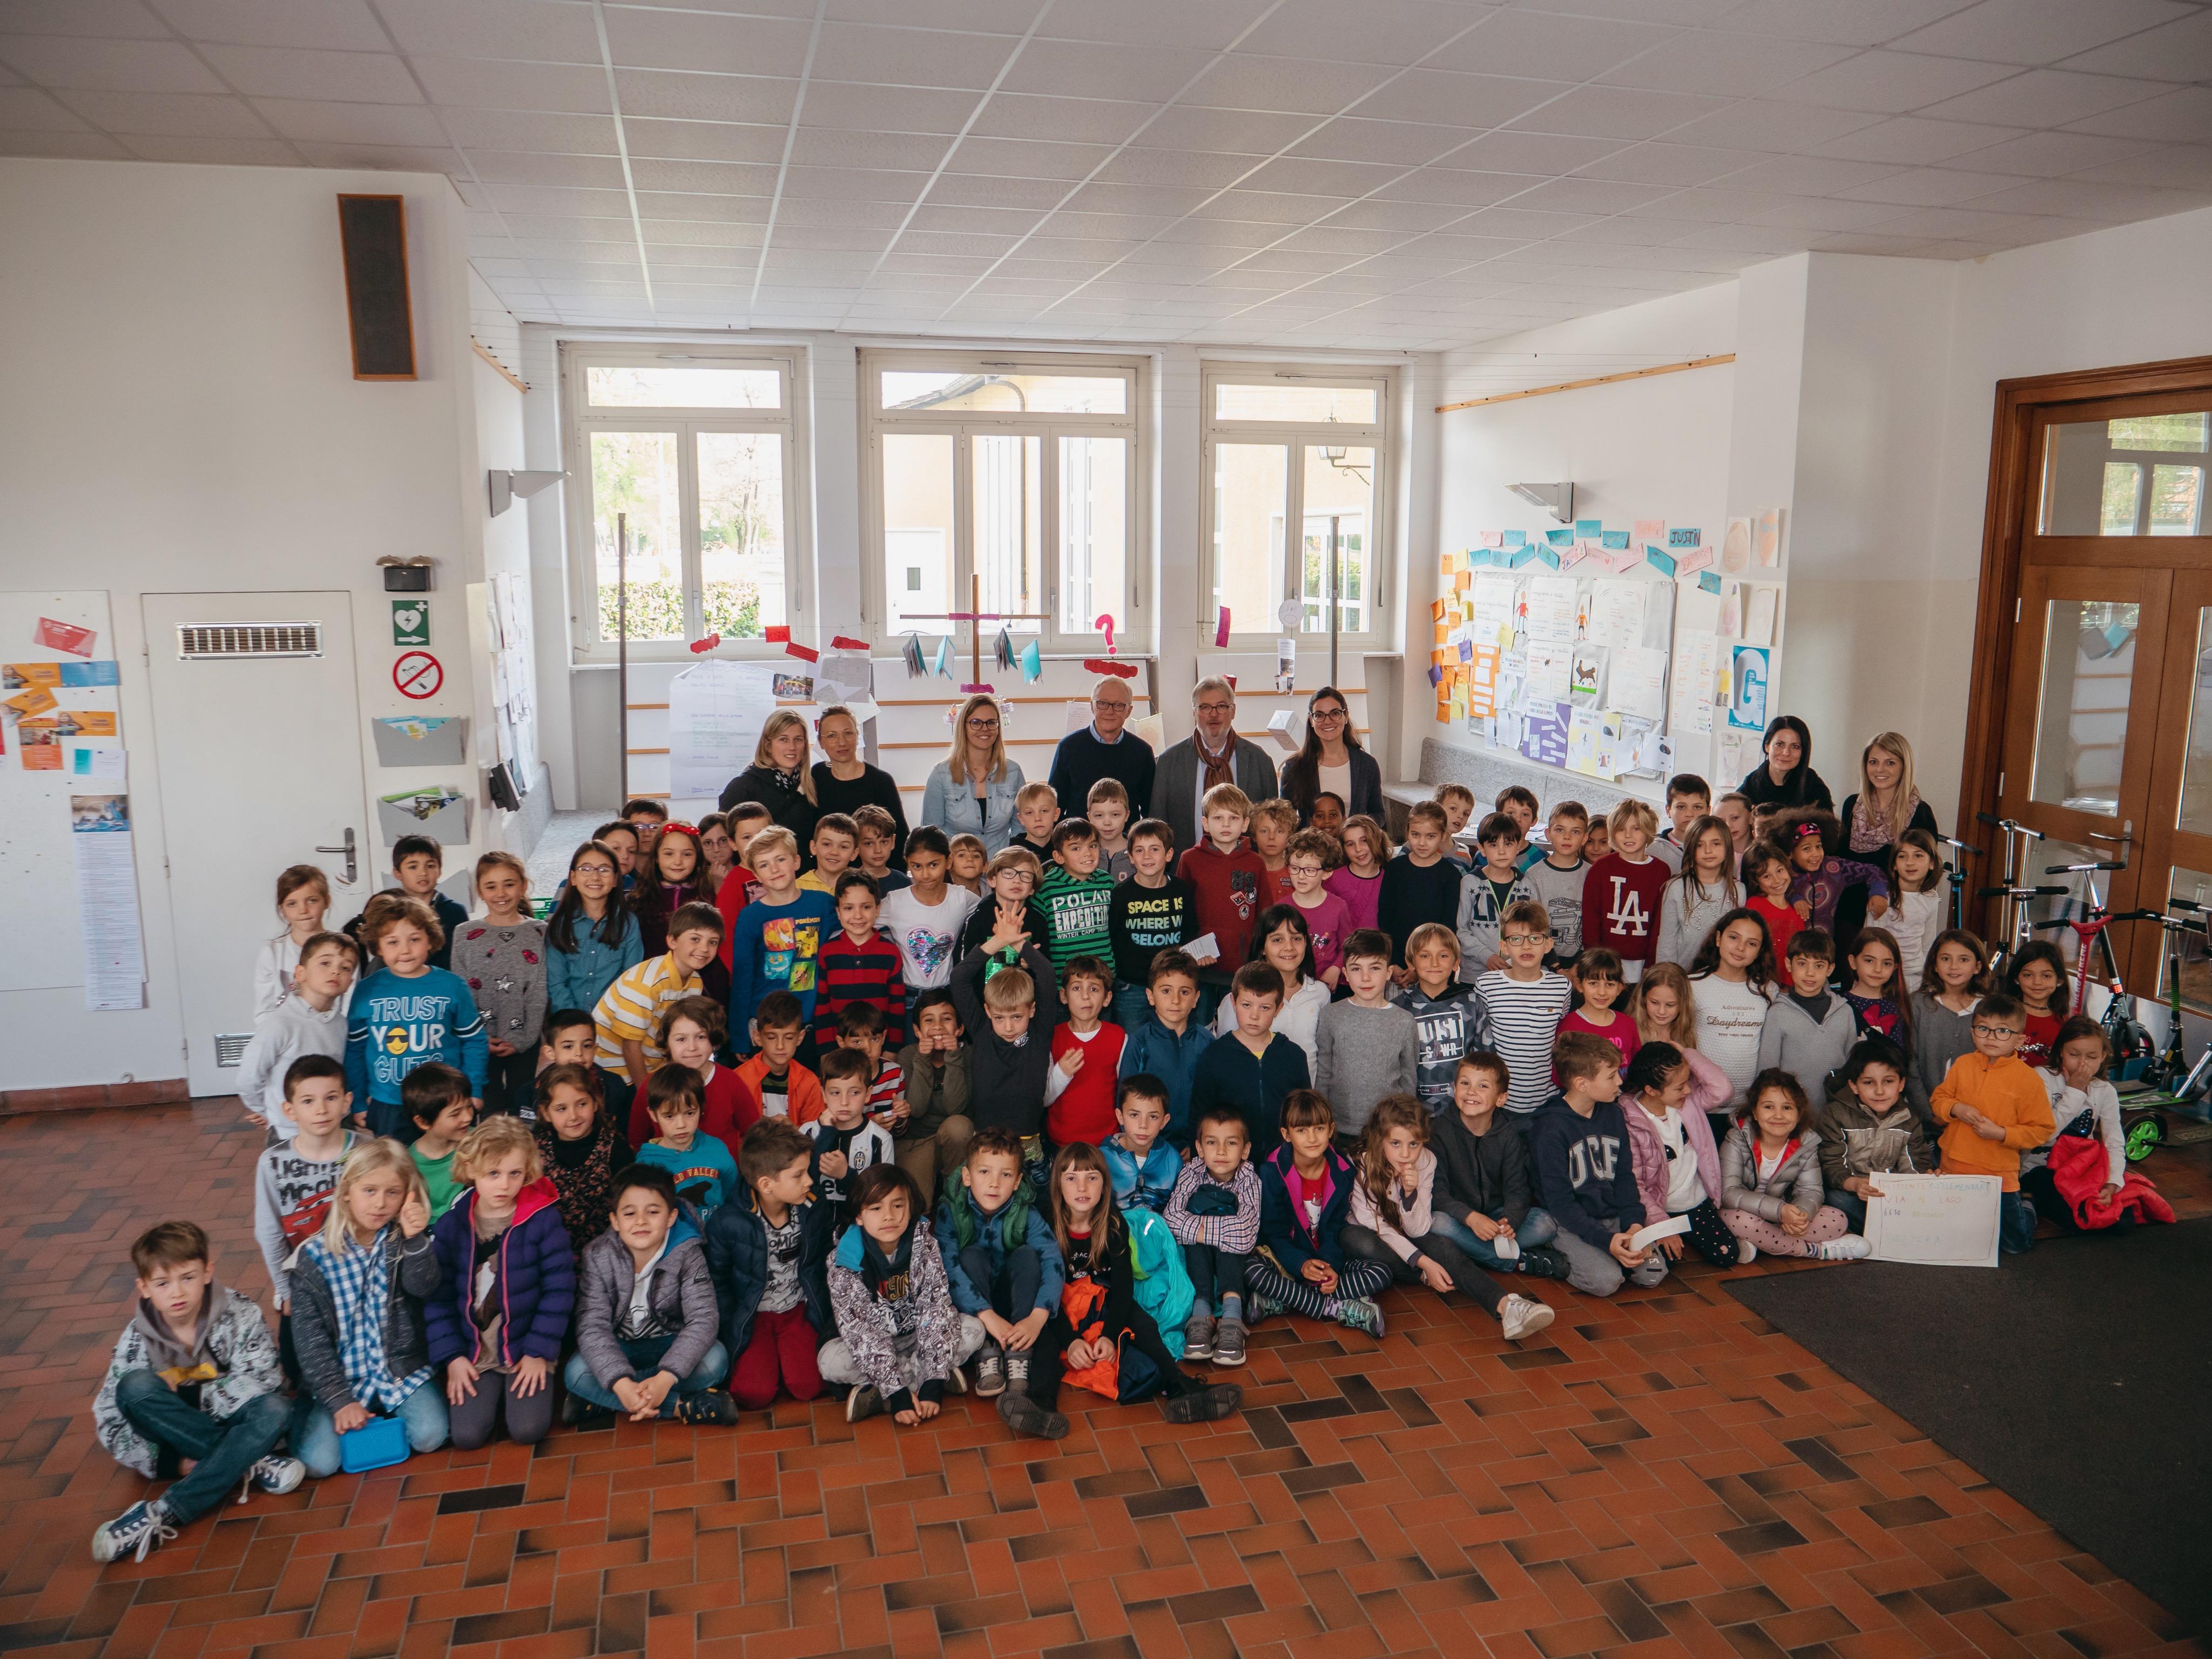 2019_04_12_Grossman_SE_Ascona_46